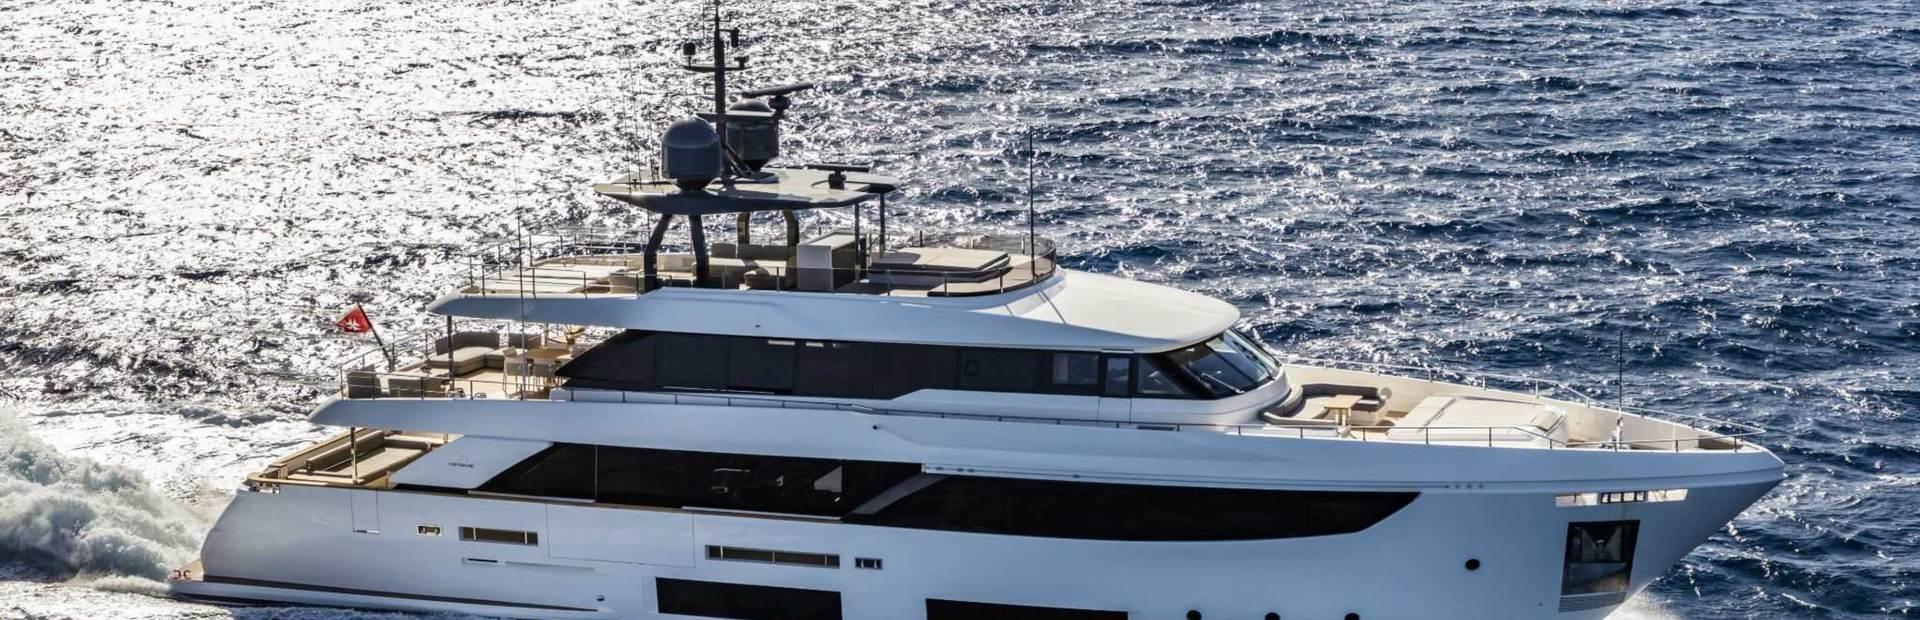 Navetta 33 Yacht Charter